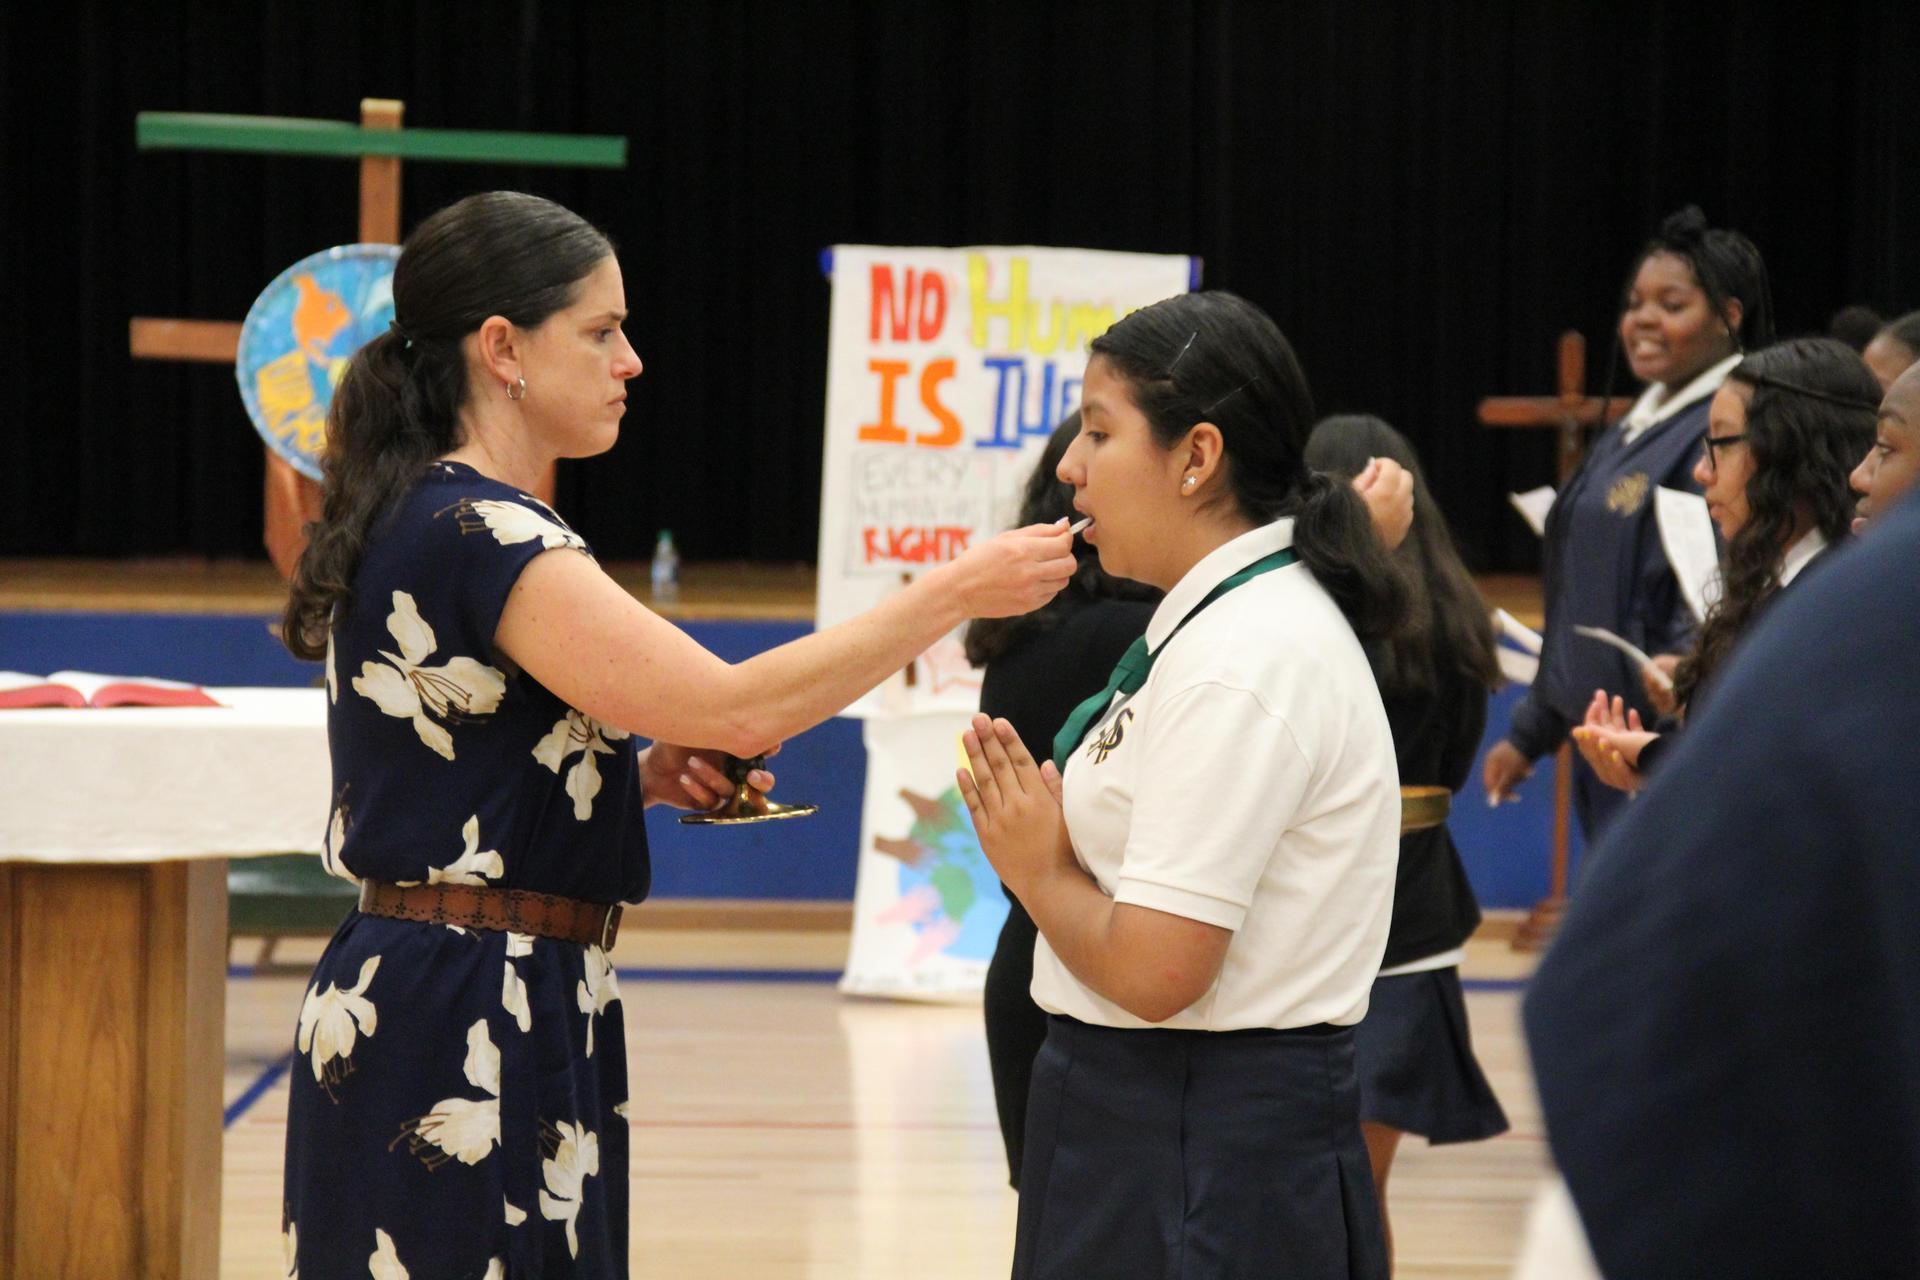 Student recieving communion